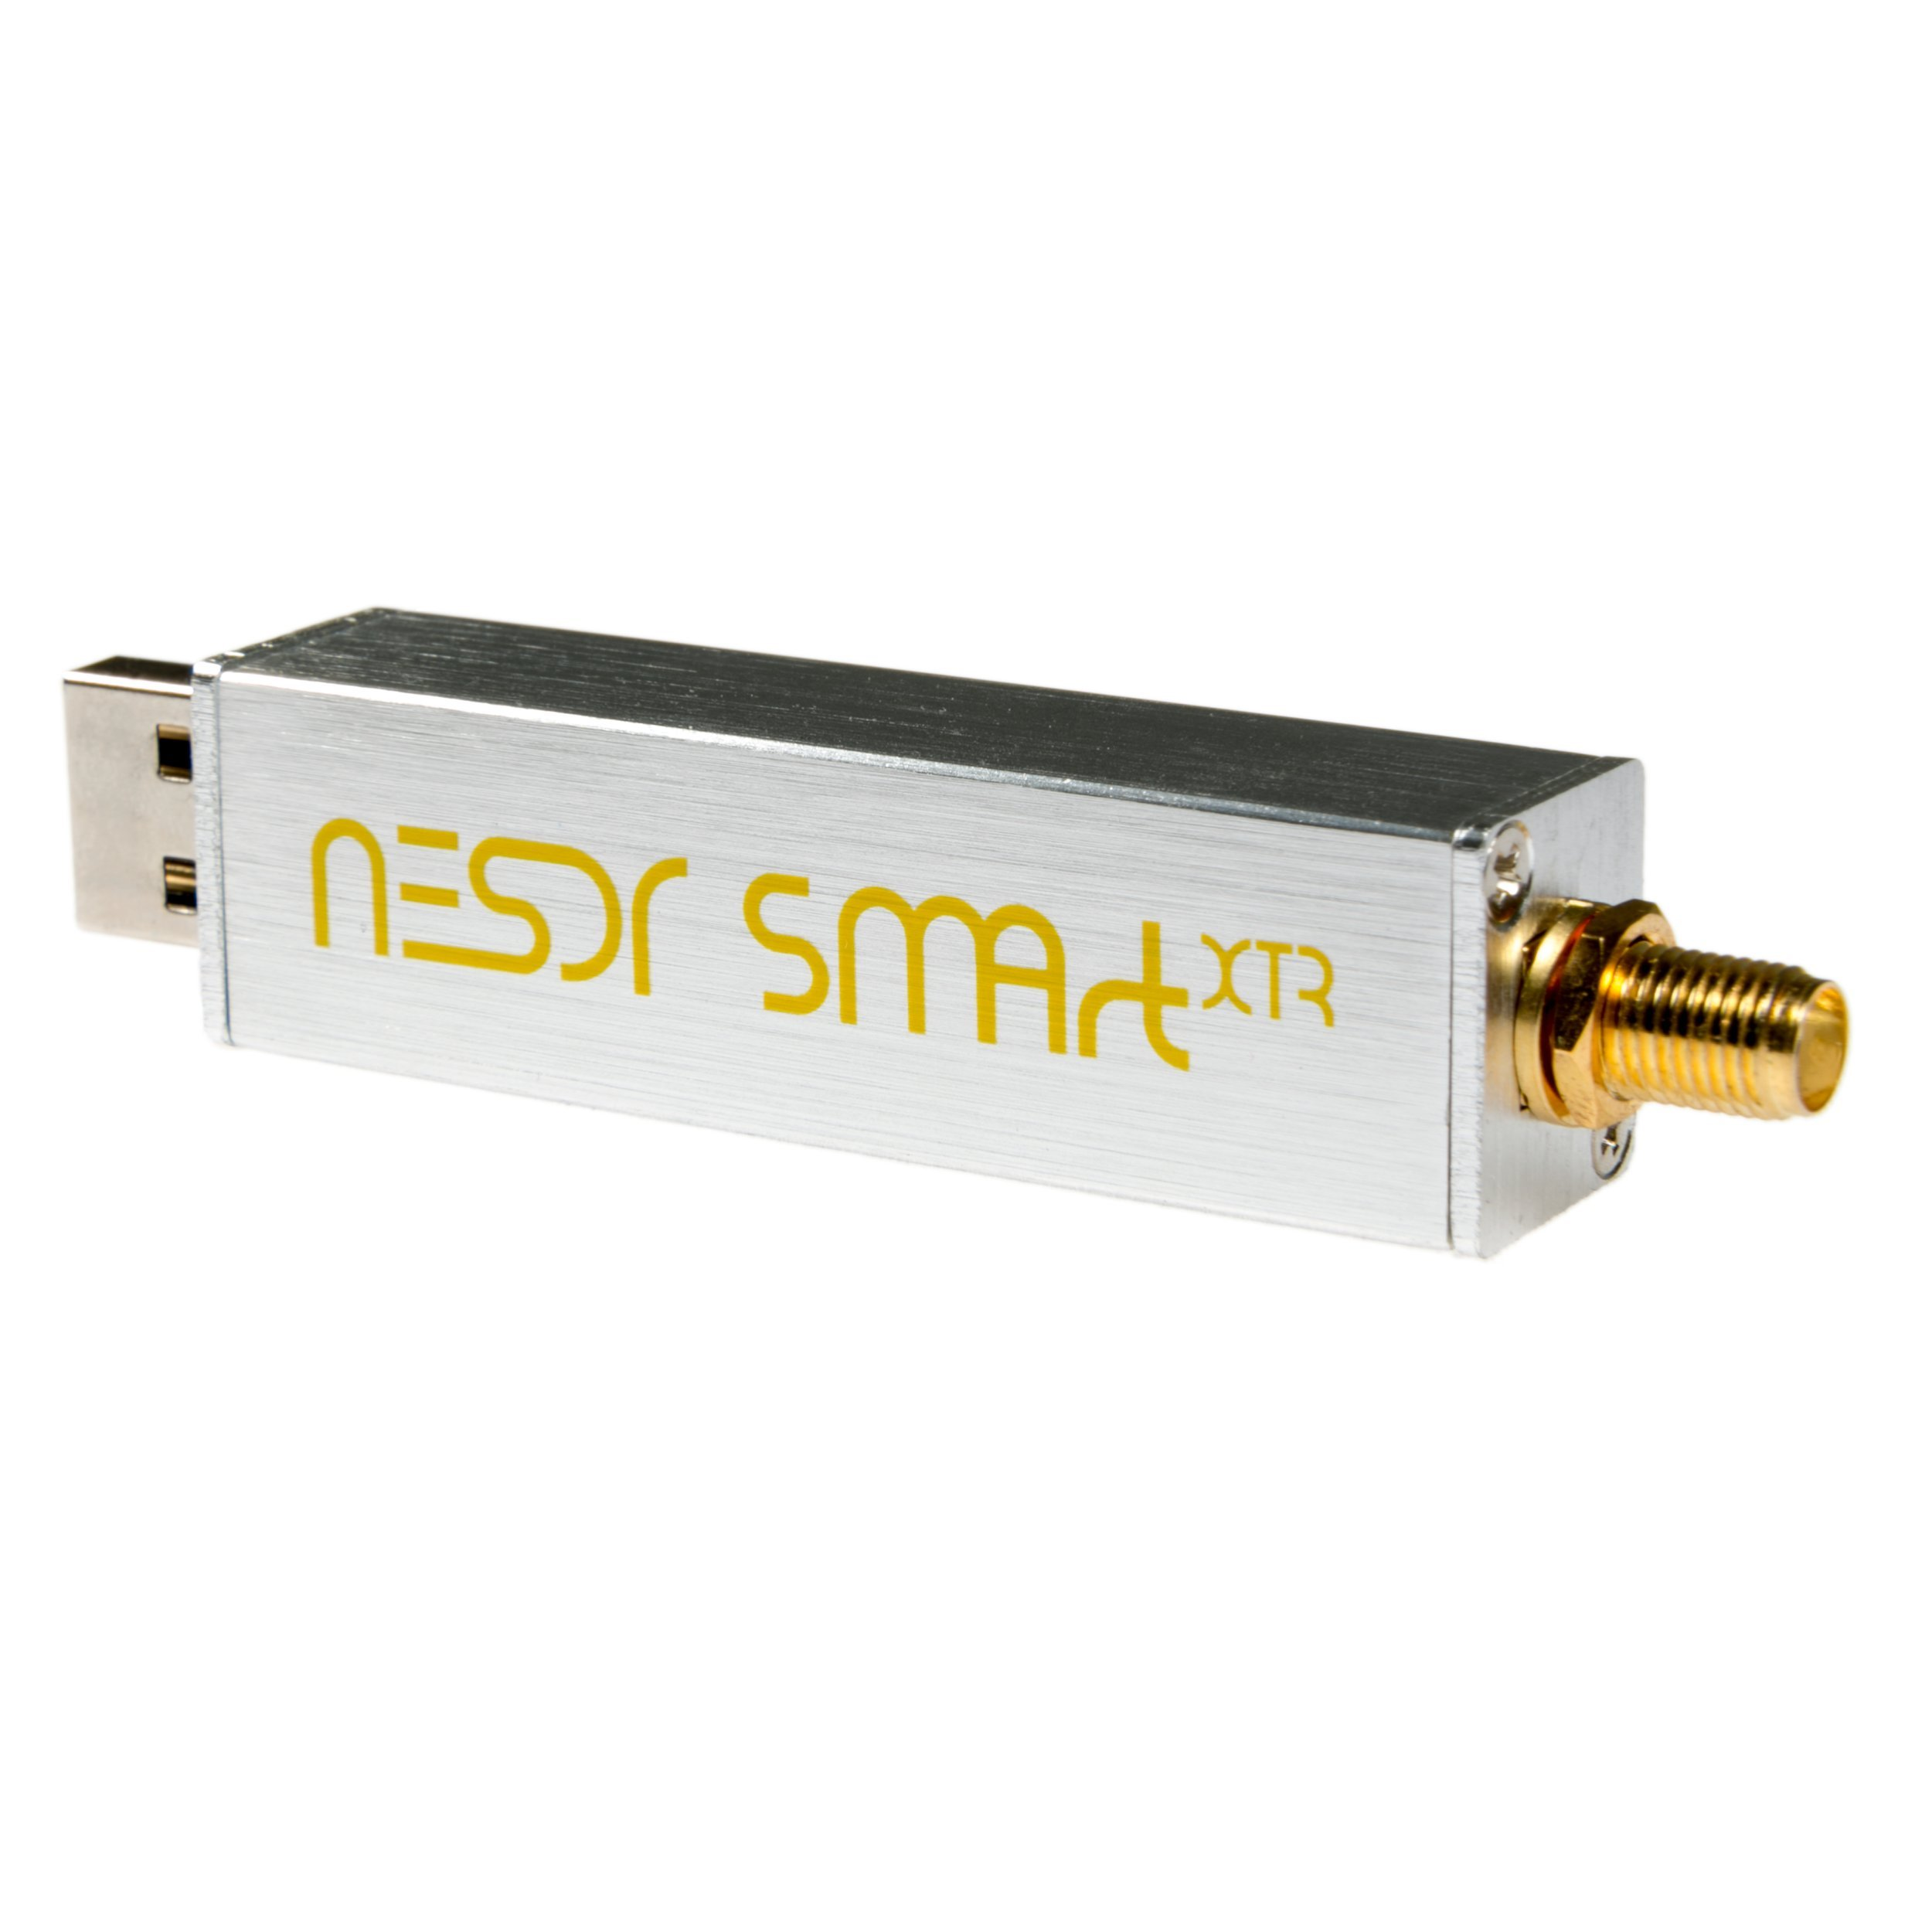 NooElec NESDR SMArt XTR SDR - Premium RTL-SDR w/Extended Tuning Range, Aluminum Enclosure, 0.5PPM TCXO, SMA Input. RTL2832U & E4000-Based Software Defined Radio by NooElec (Image #3)